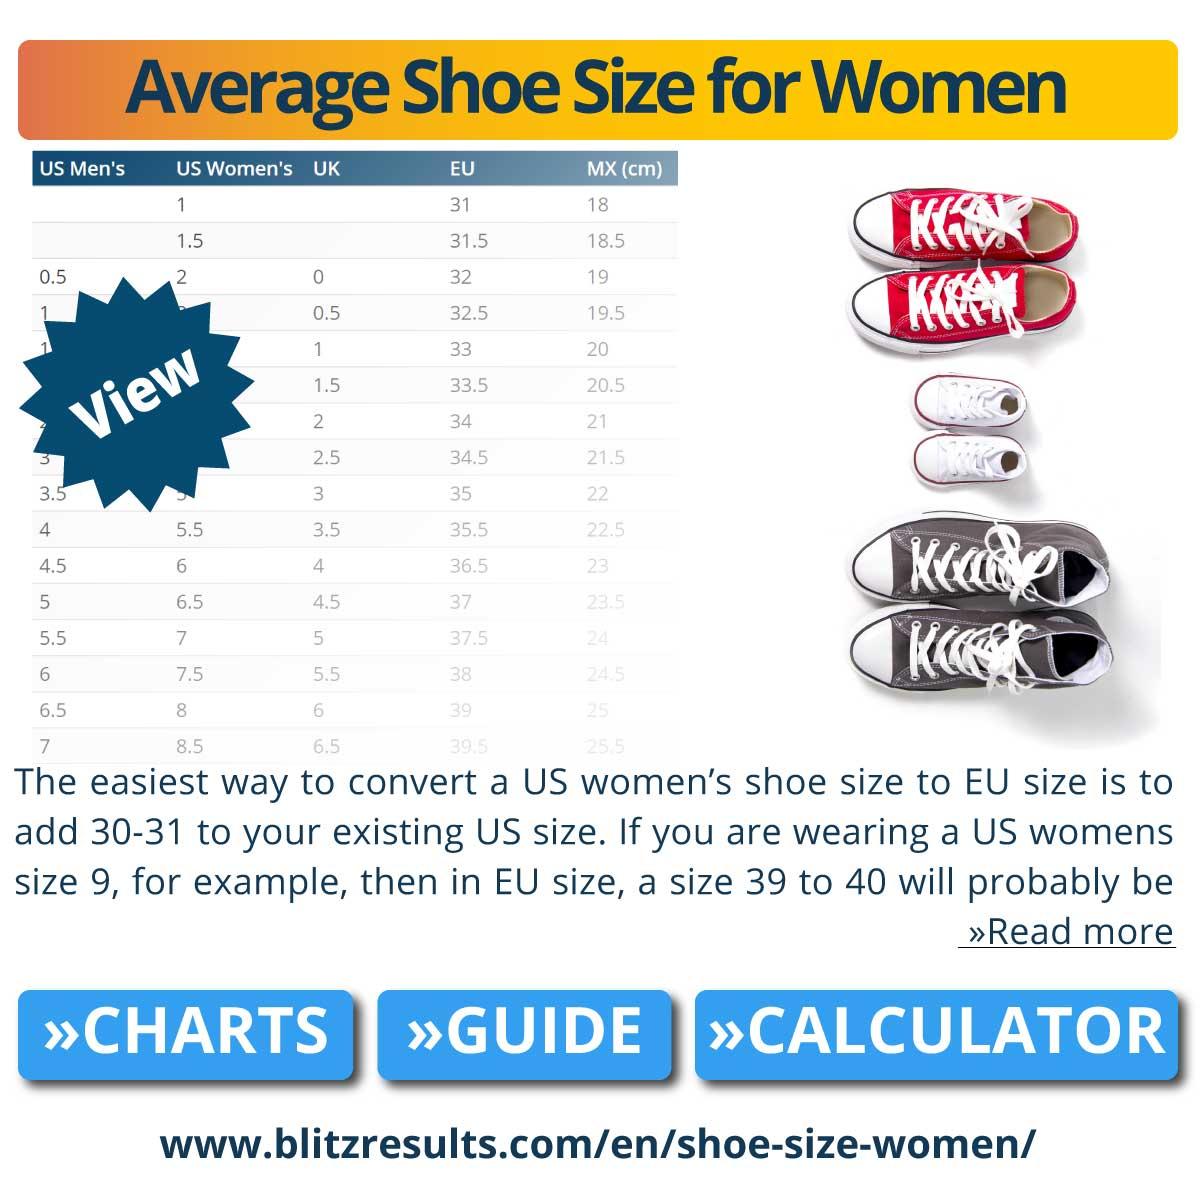 Average Shoe Size for Women